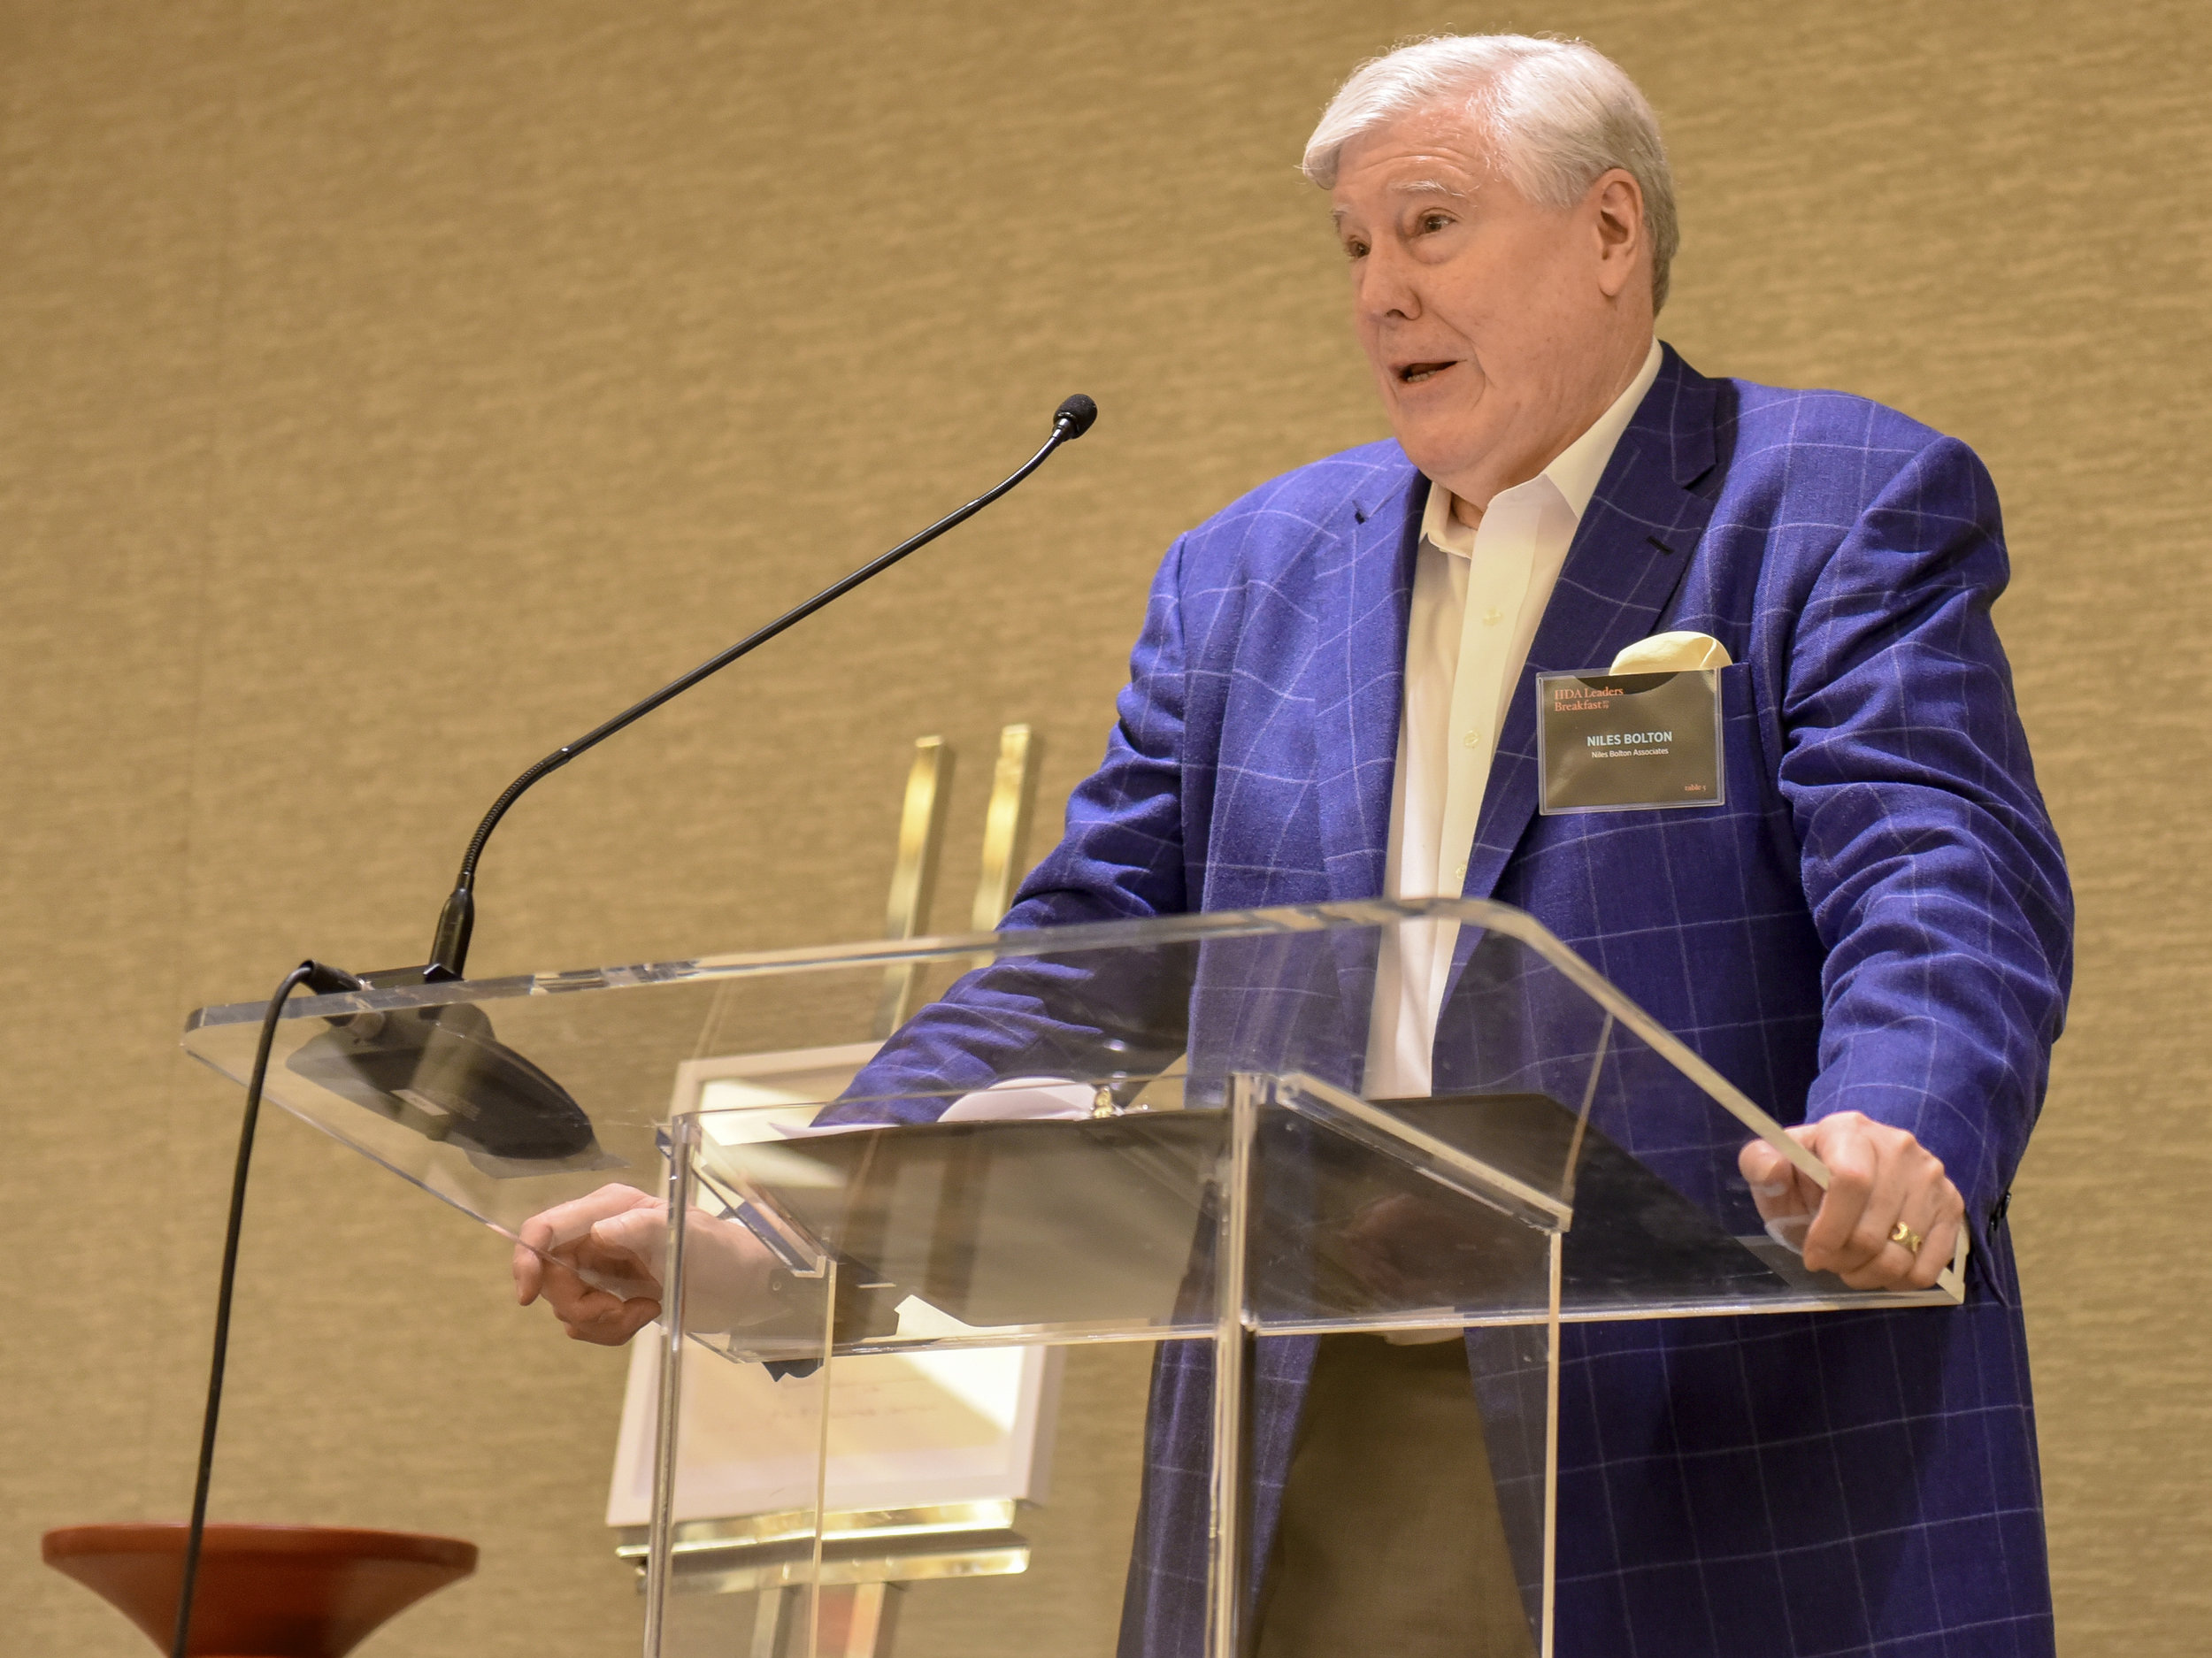 Chairman and CEO, Niles Bolton, giving an introduction speech for Stephanie